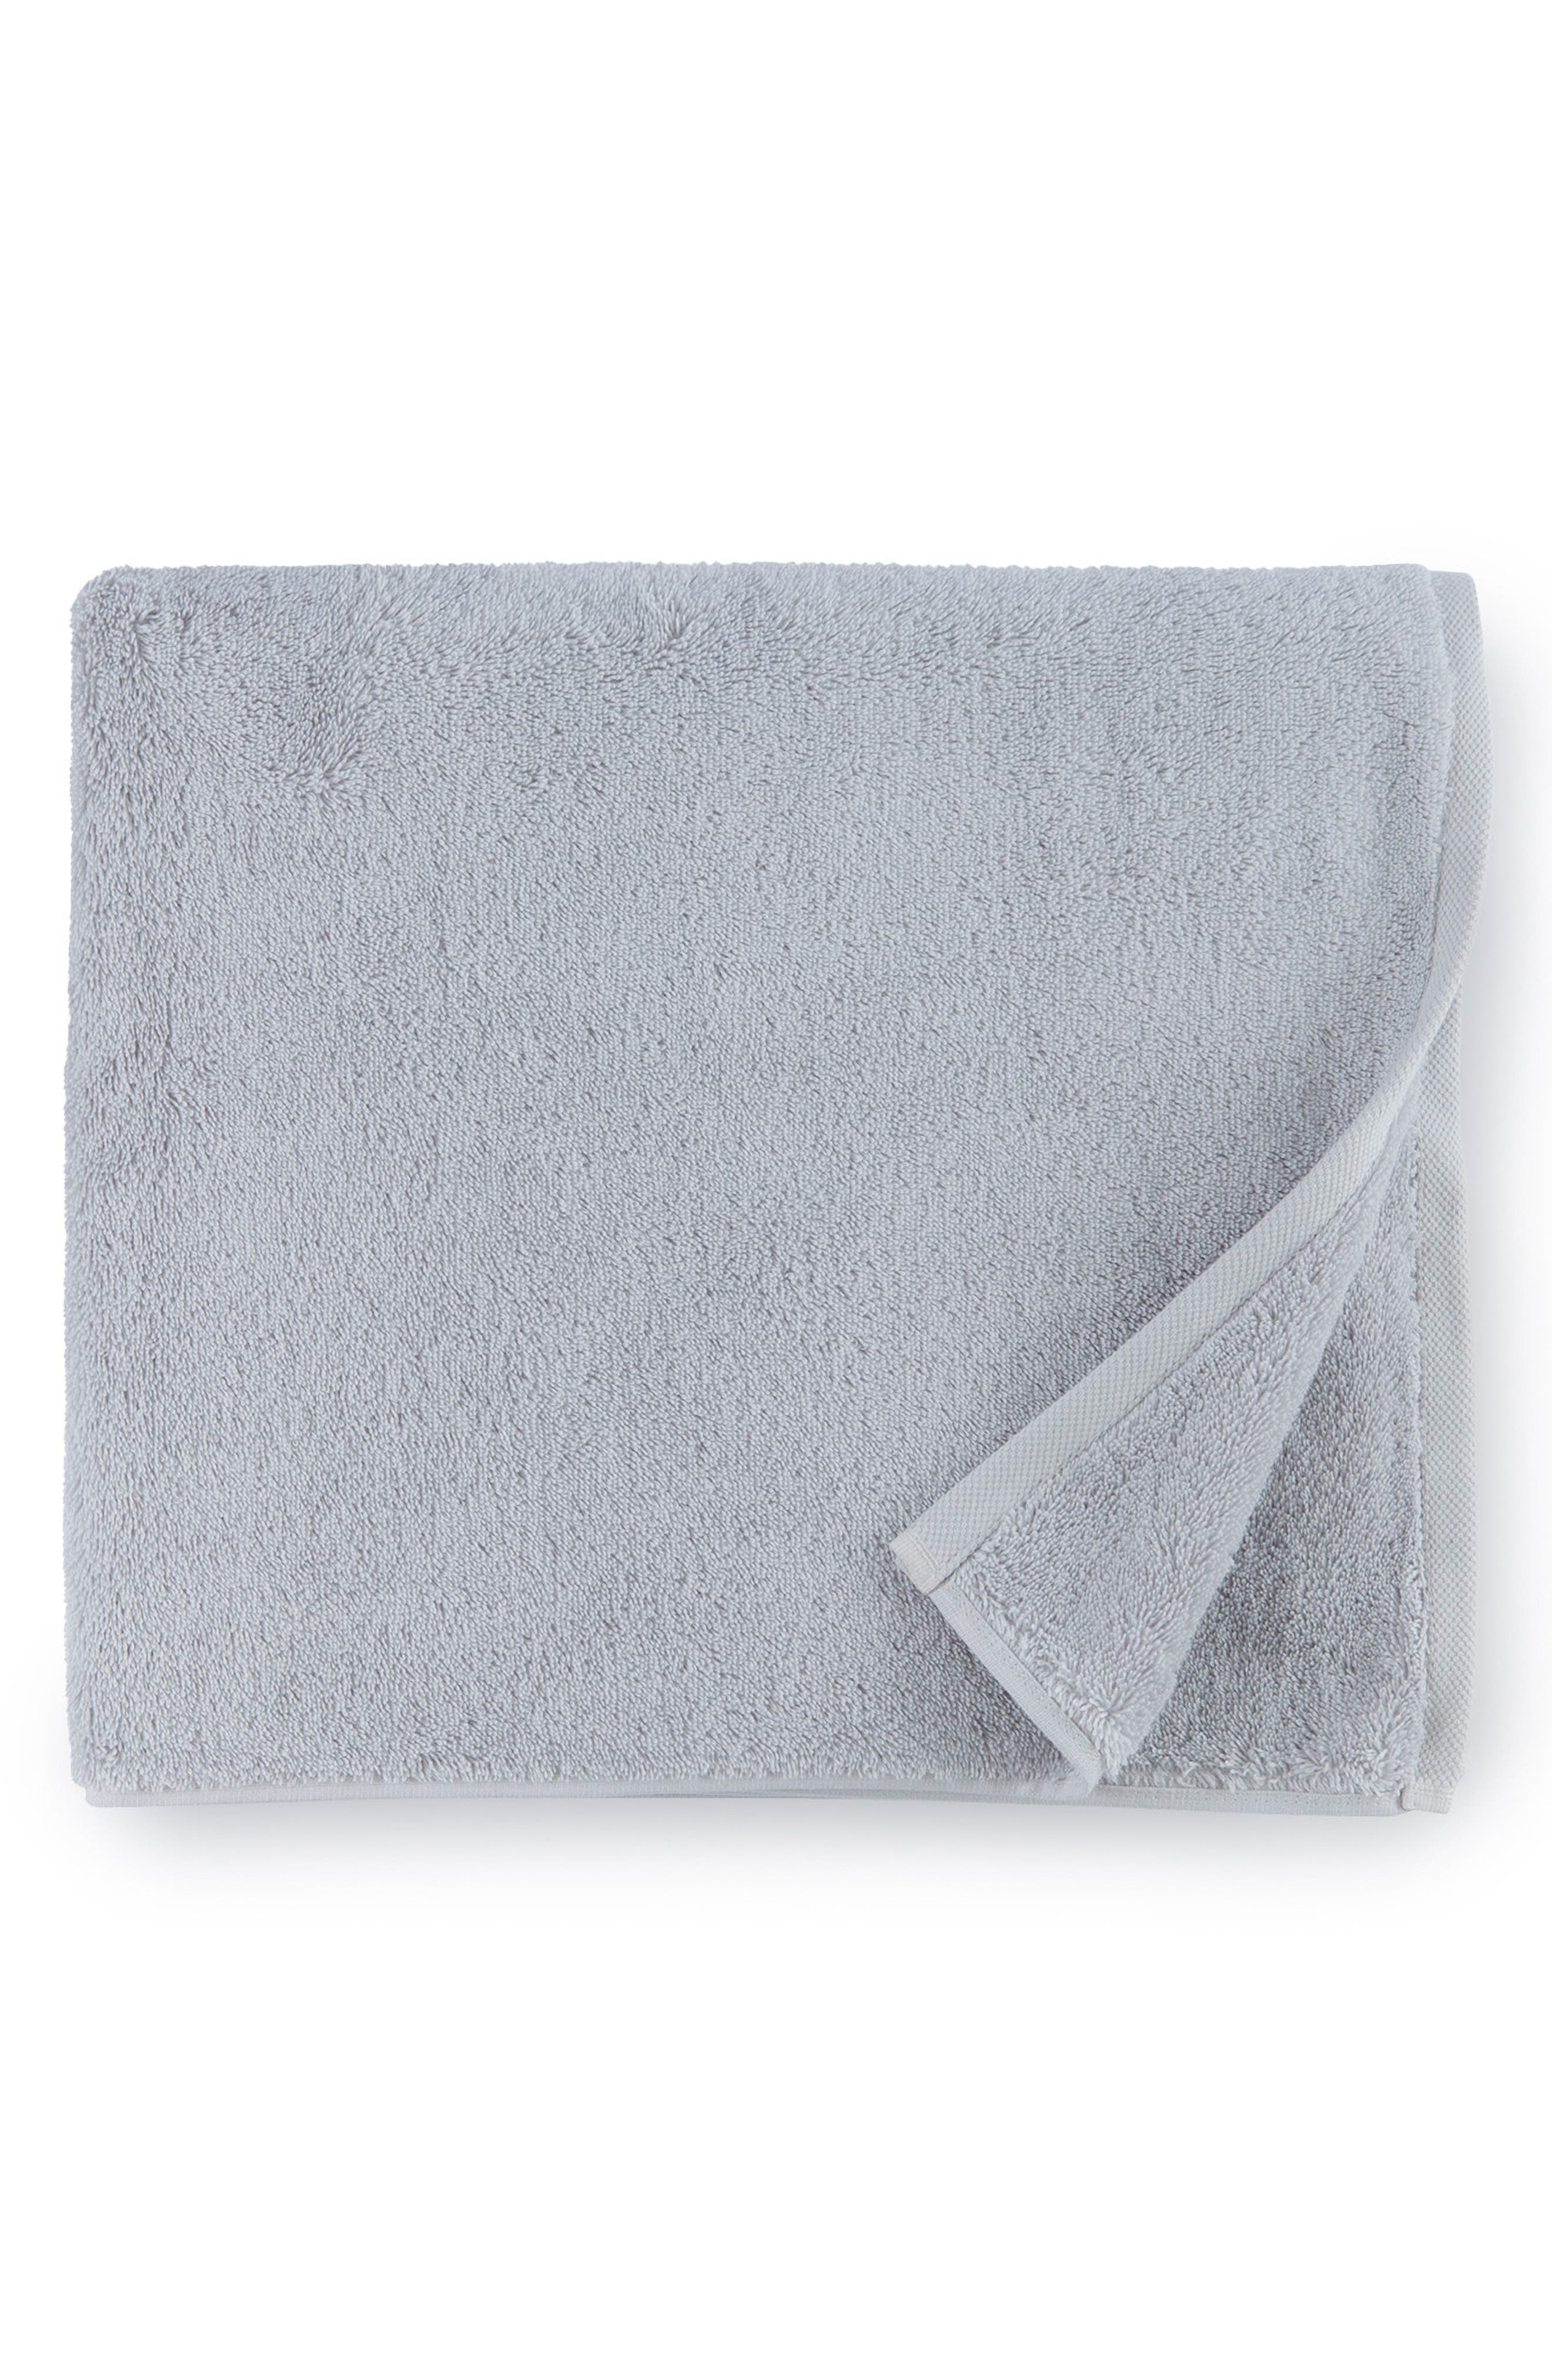 Sarma Hand Towel,                         Main,                         color, 020